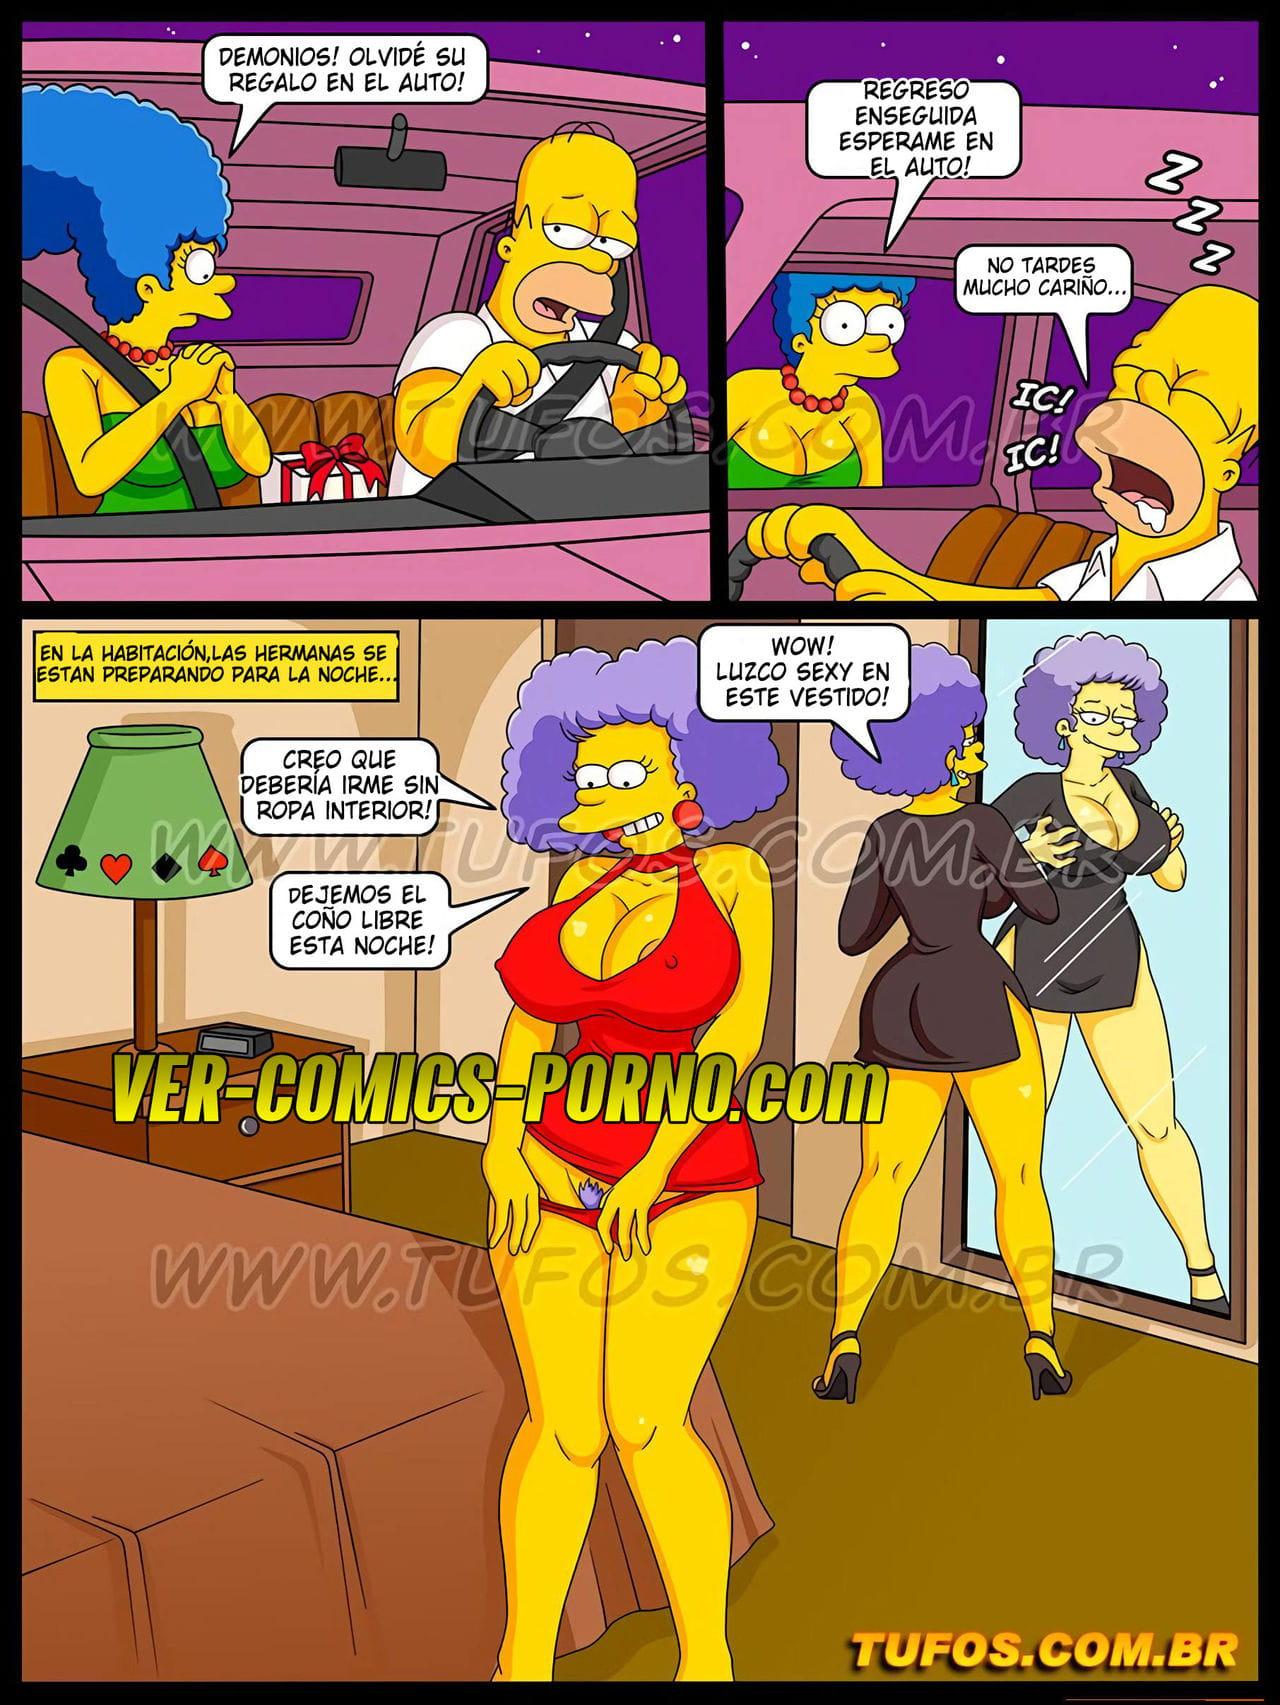 Porno the comic simpsons The Simpsons